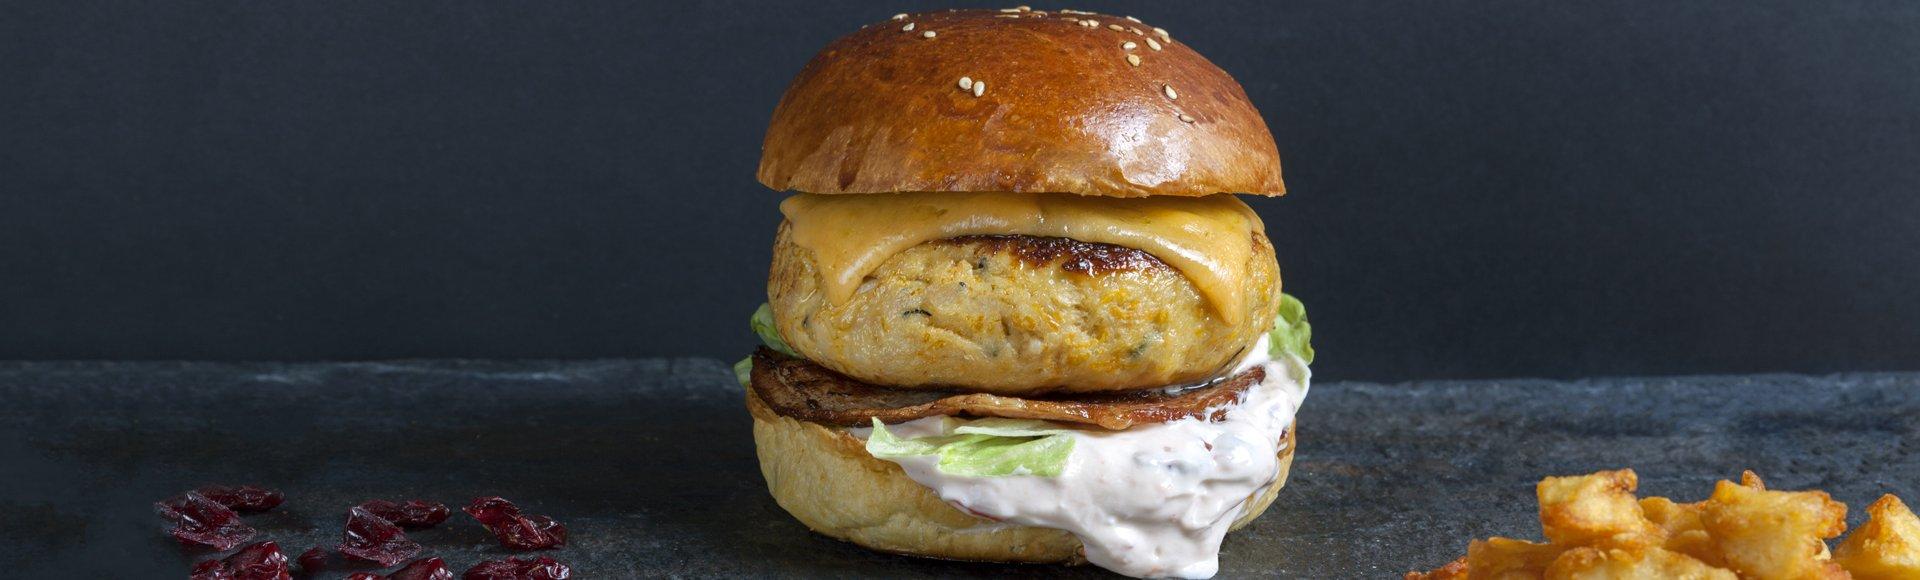 Burger γαλοπούλα, μπέικον, τσένταρ & σάλτσα κράνμπερι